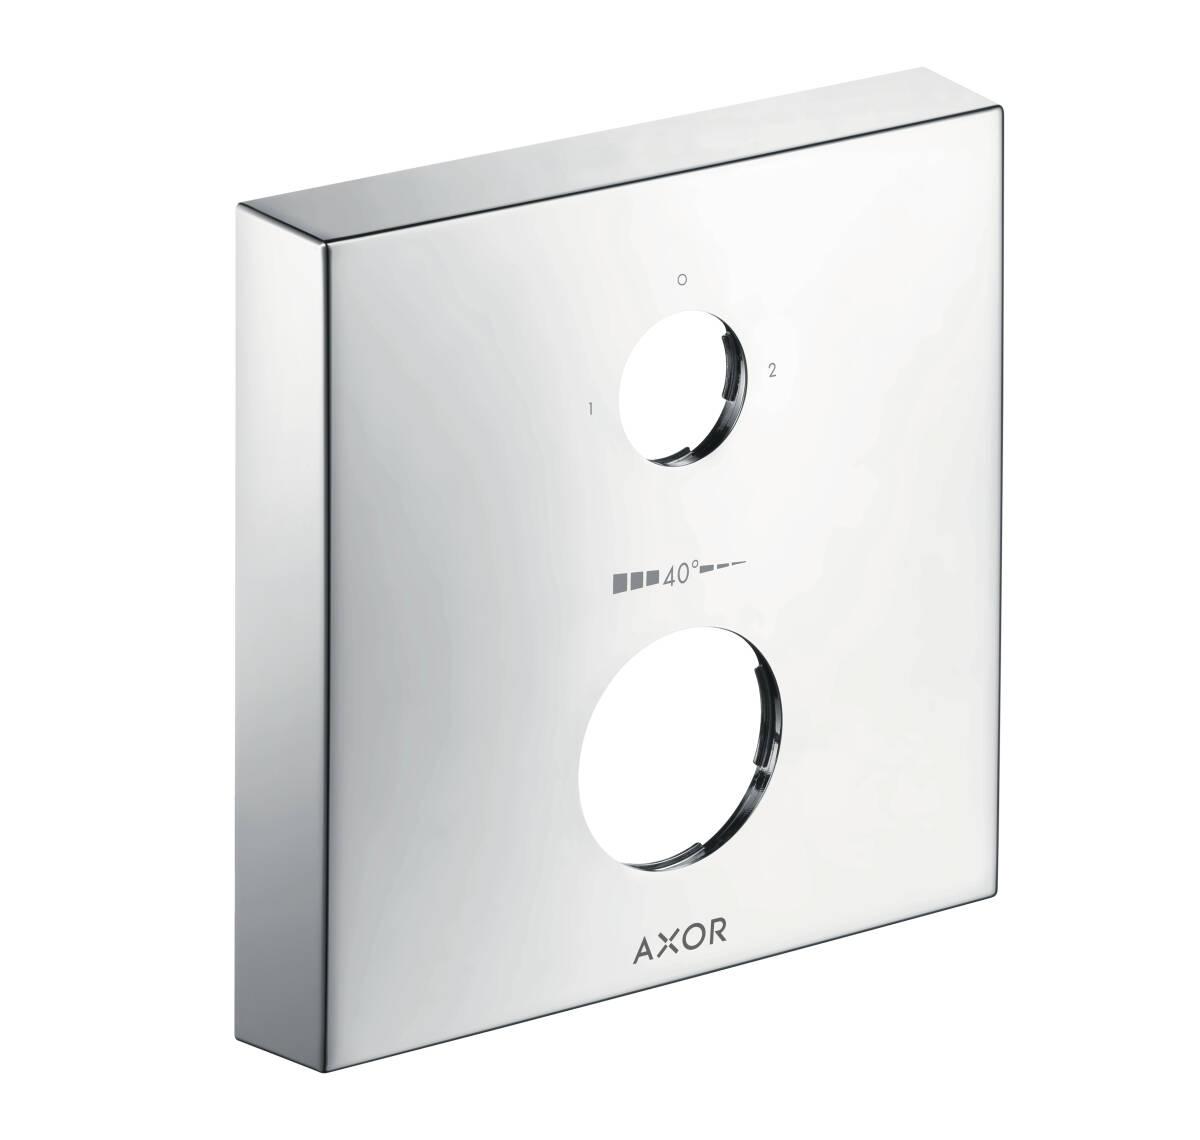 Extension escutcheon square two hole 0-1-2, Chrome, 14969000